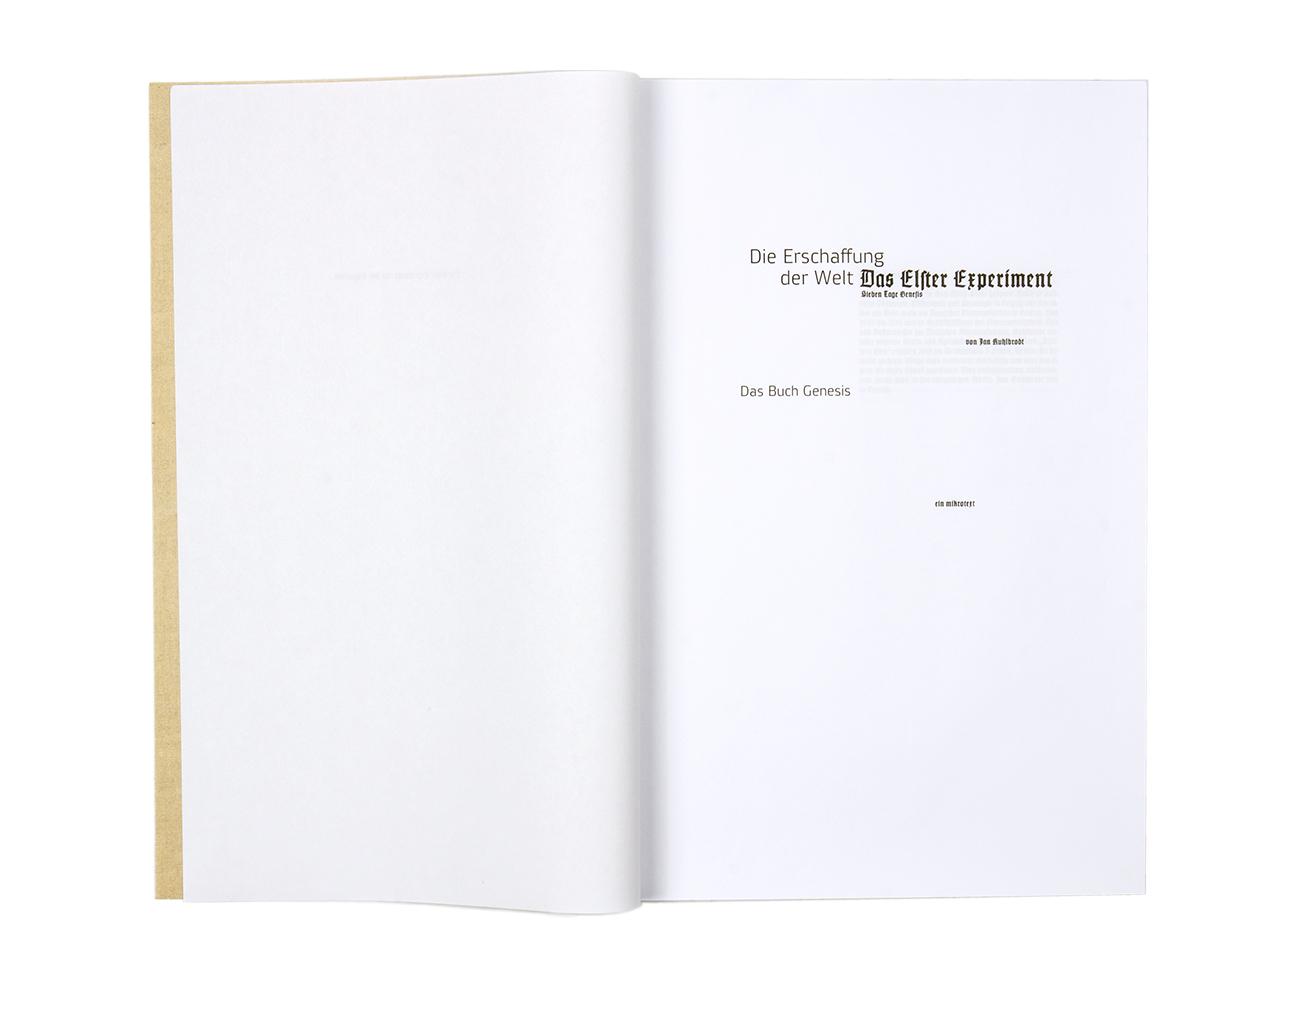 Das Elster Experiment E-book Buchgestaltung editorial design Typographie